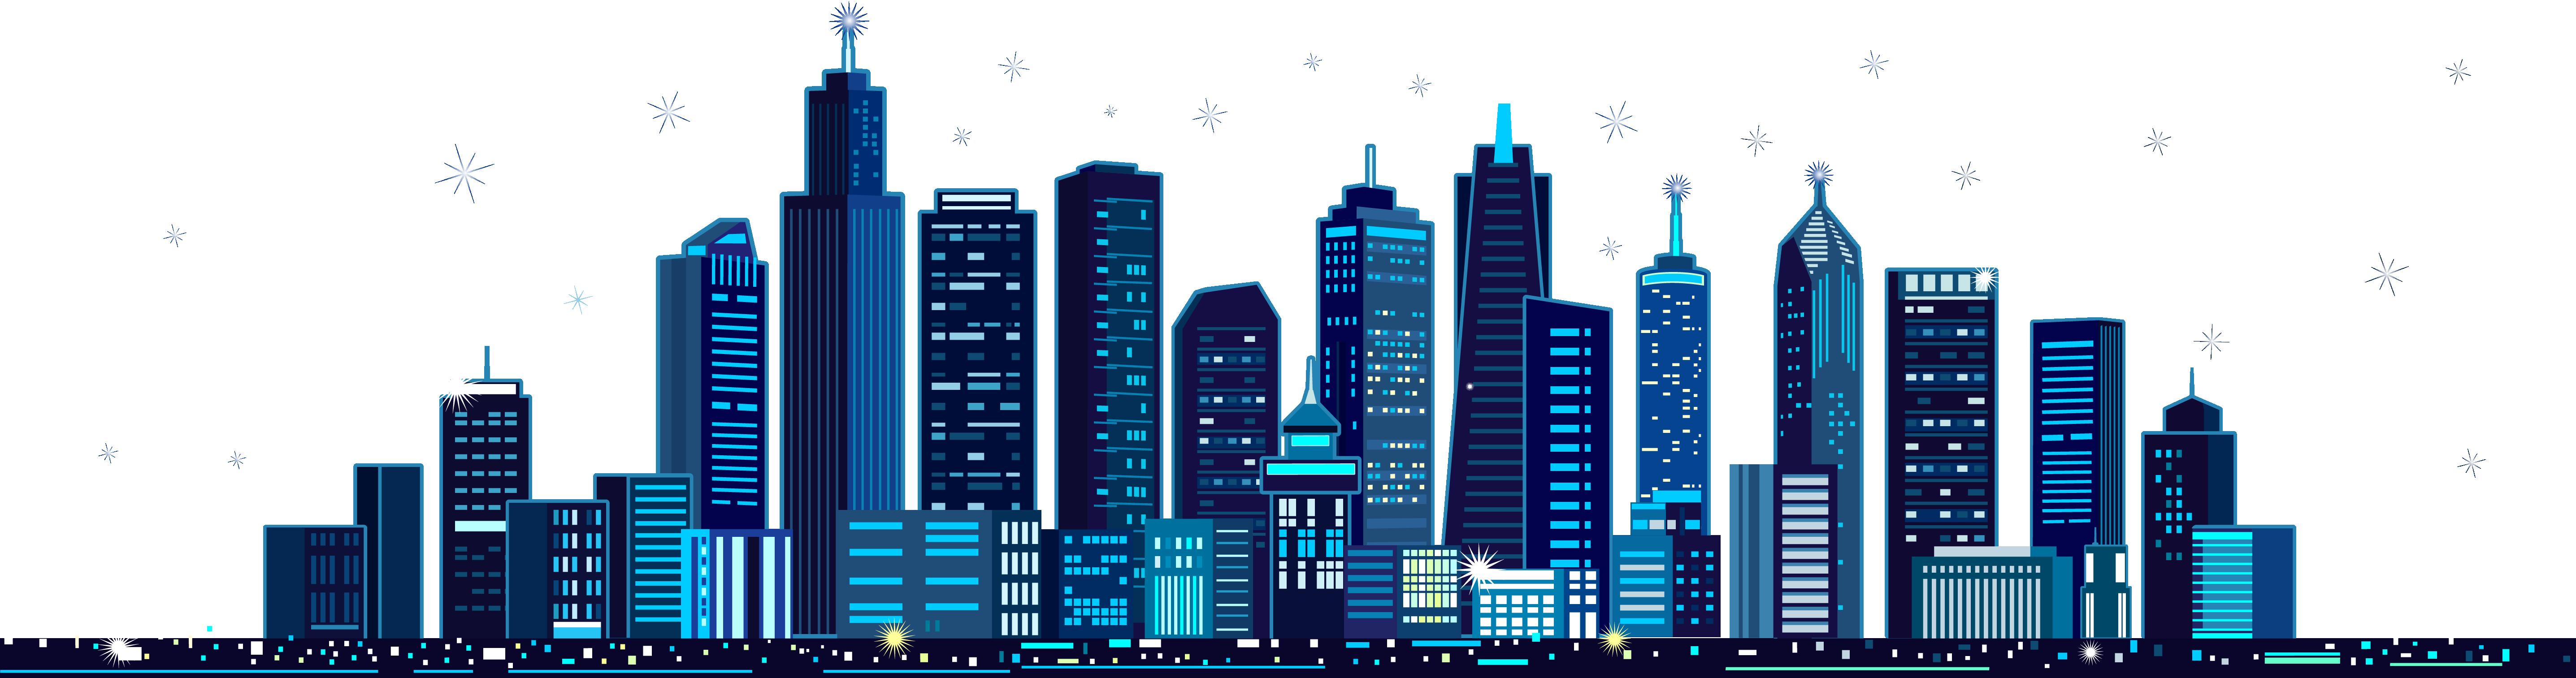 9-97643_mid-autumn-festival-illustration-city-building-vector-png